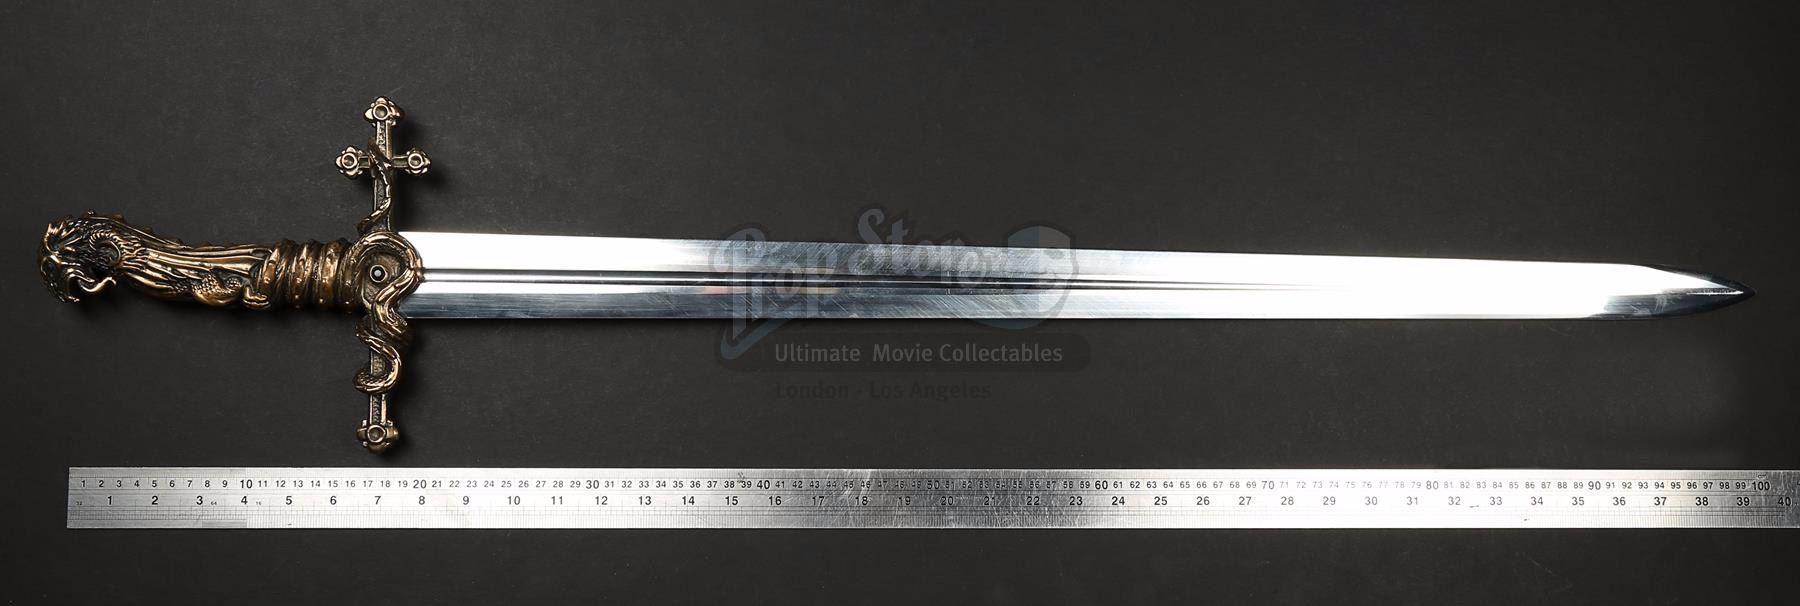 DRACULA UNTOLD (2014) - Vlad's (Luke Evans) Sword